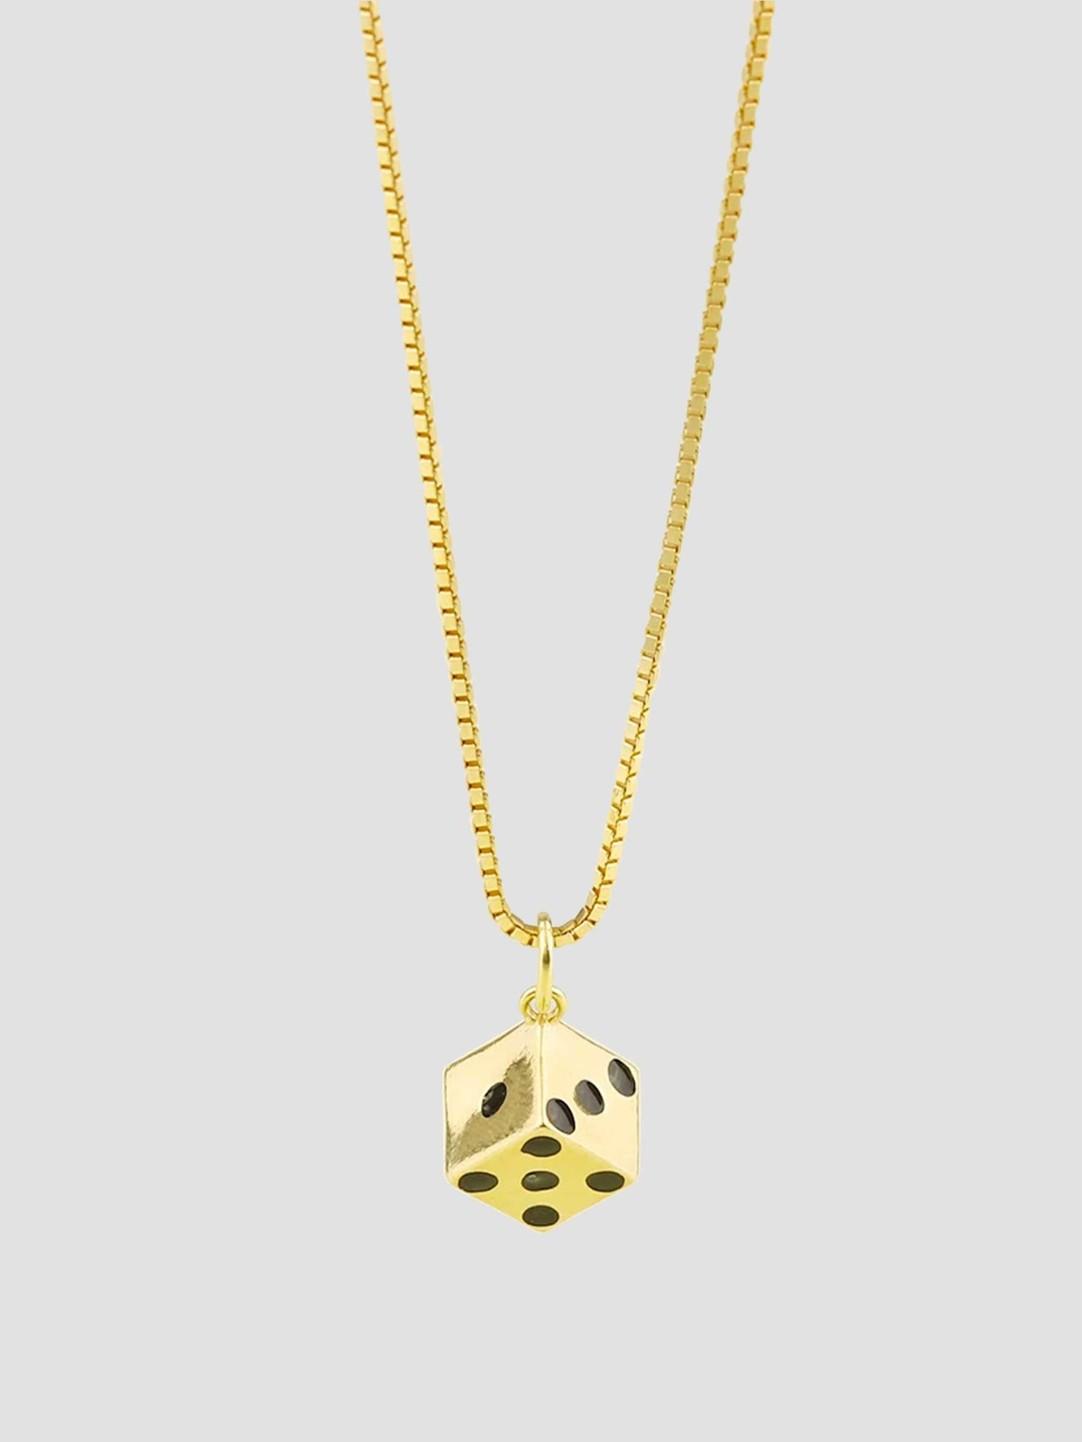 Golia Golia Dice Necklace 55cm 14k Gold